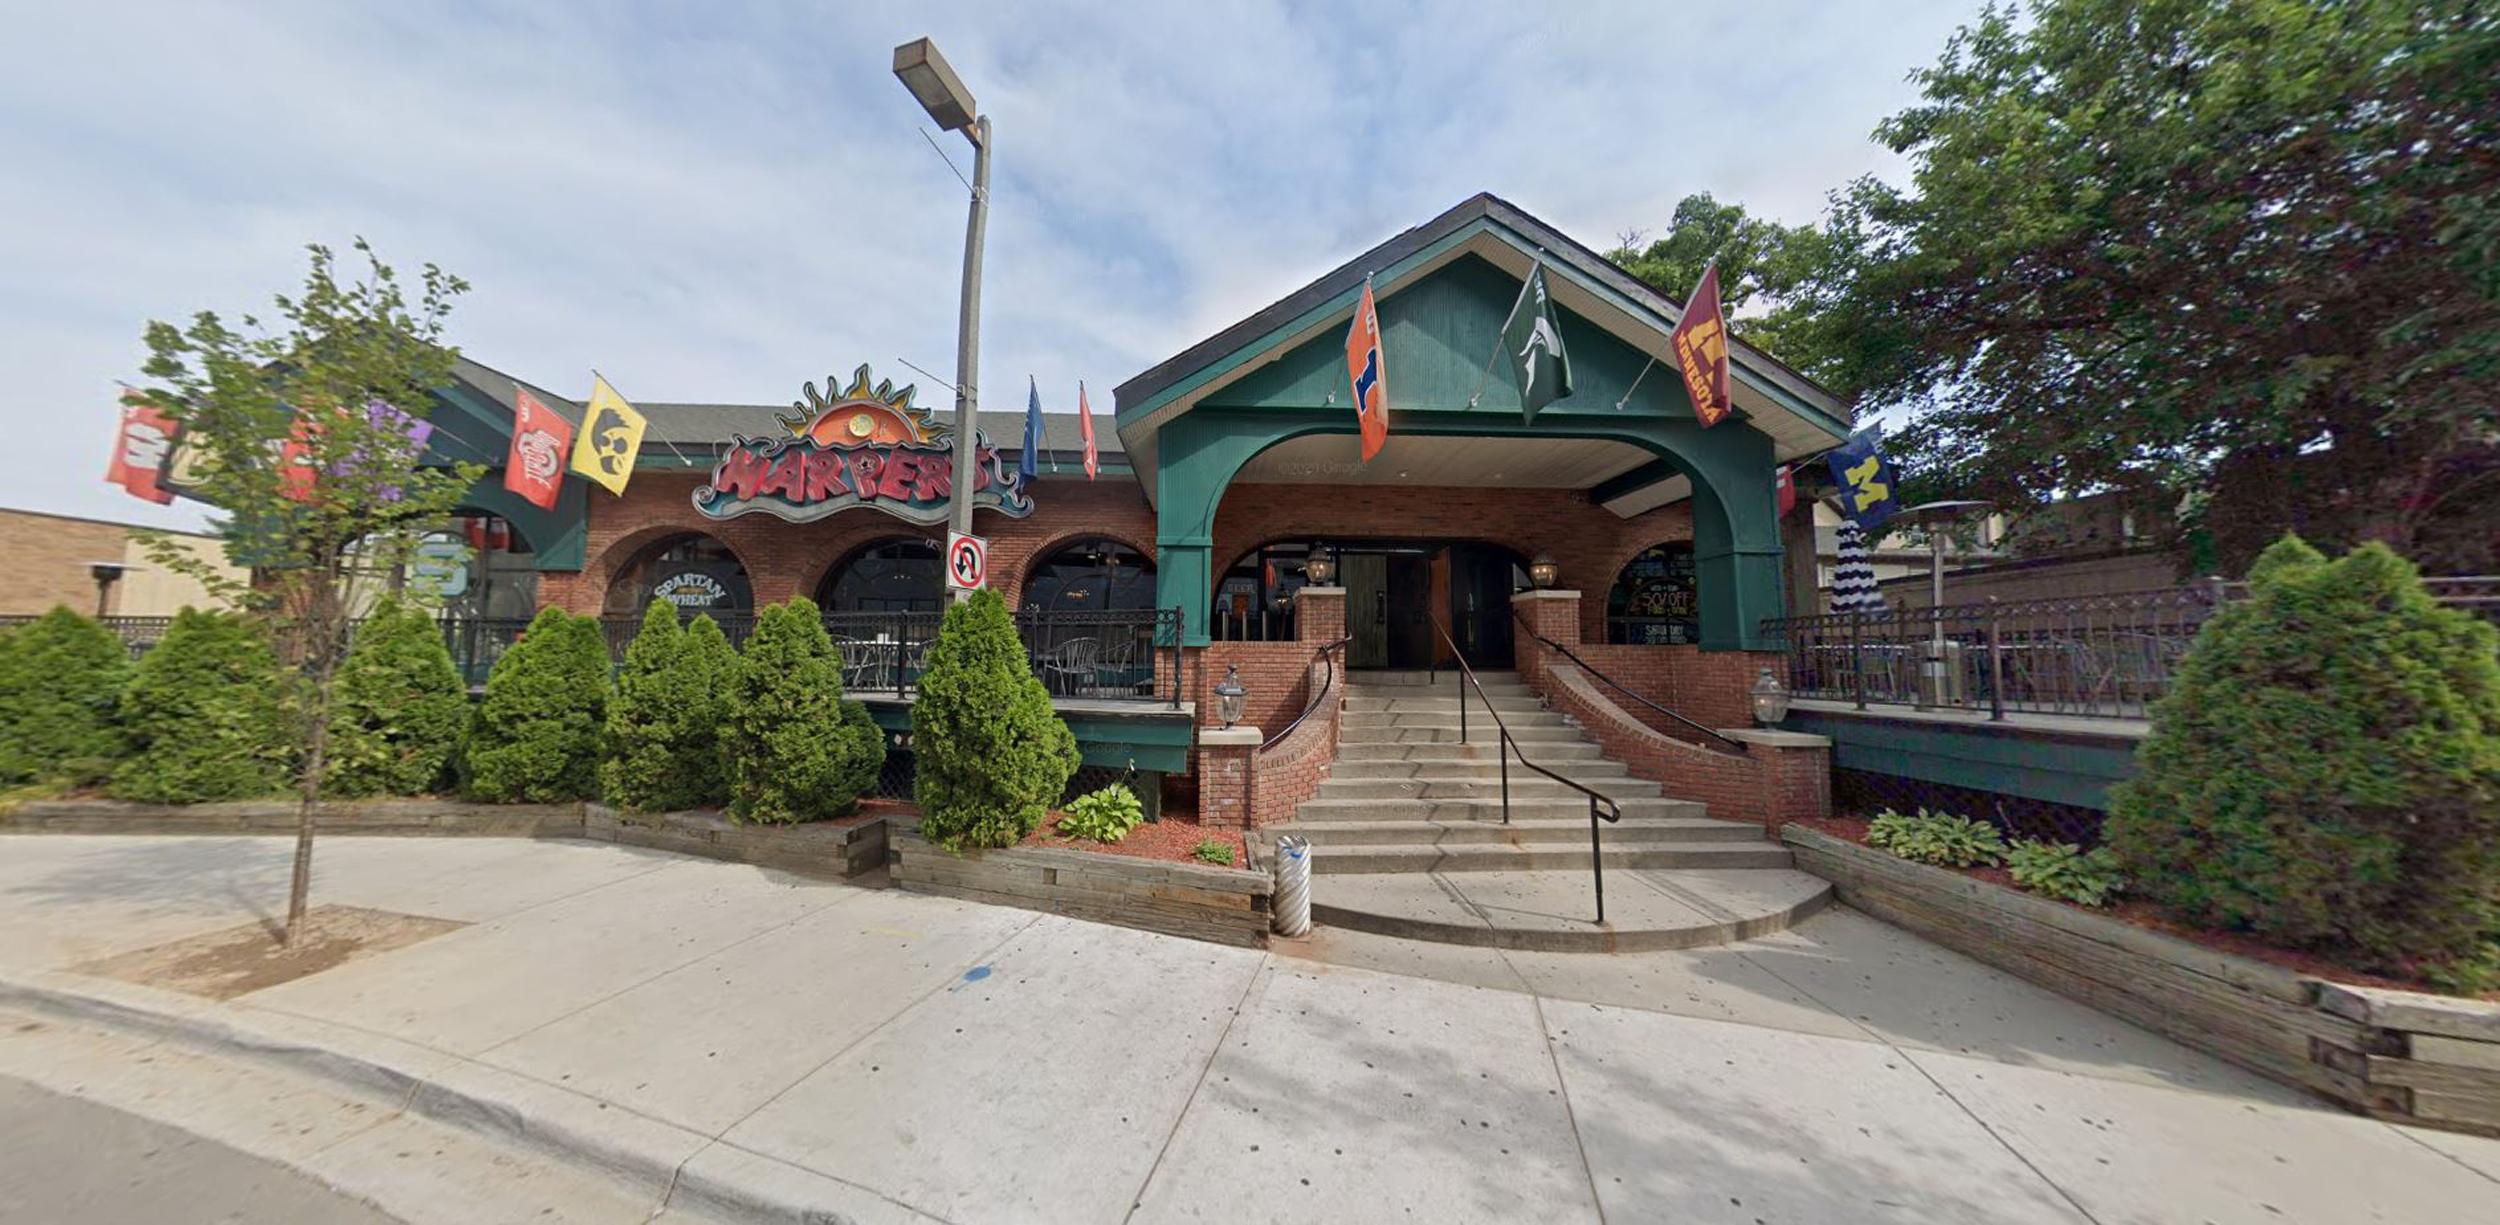 Image: Harper's Restaurant & Brewpub (Google)